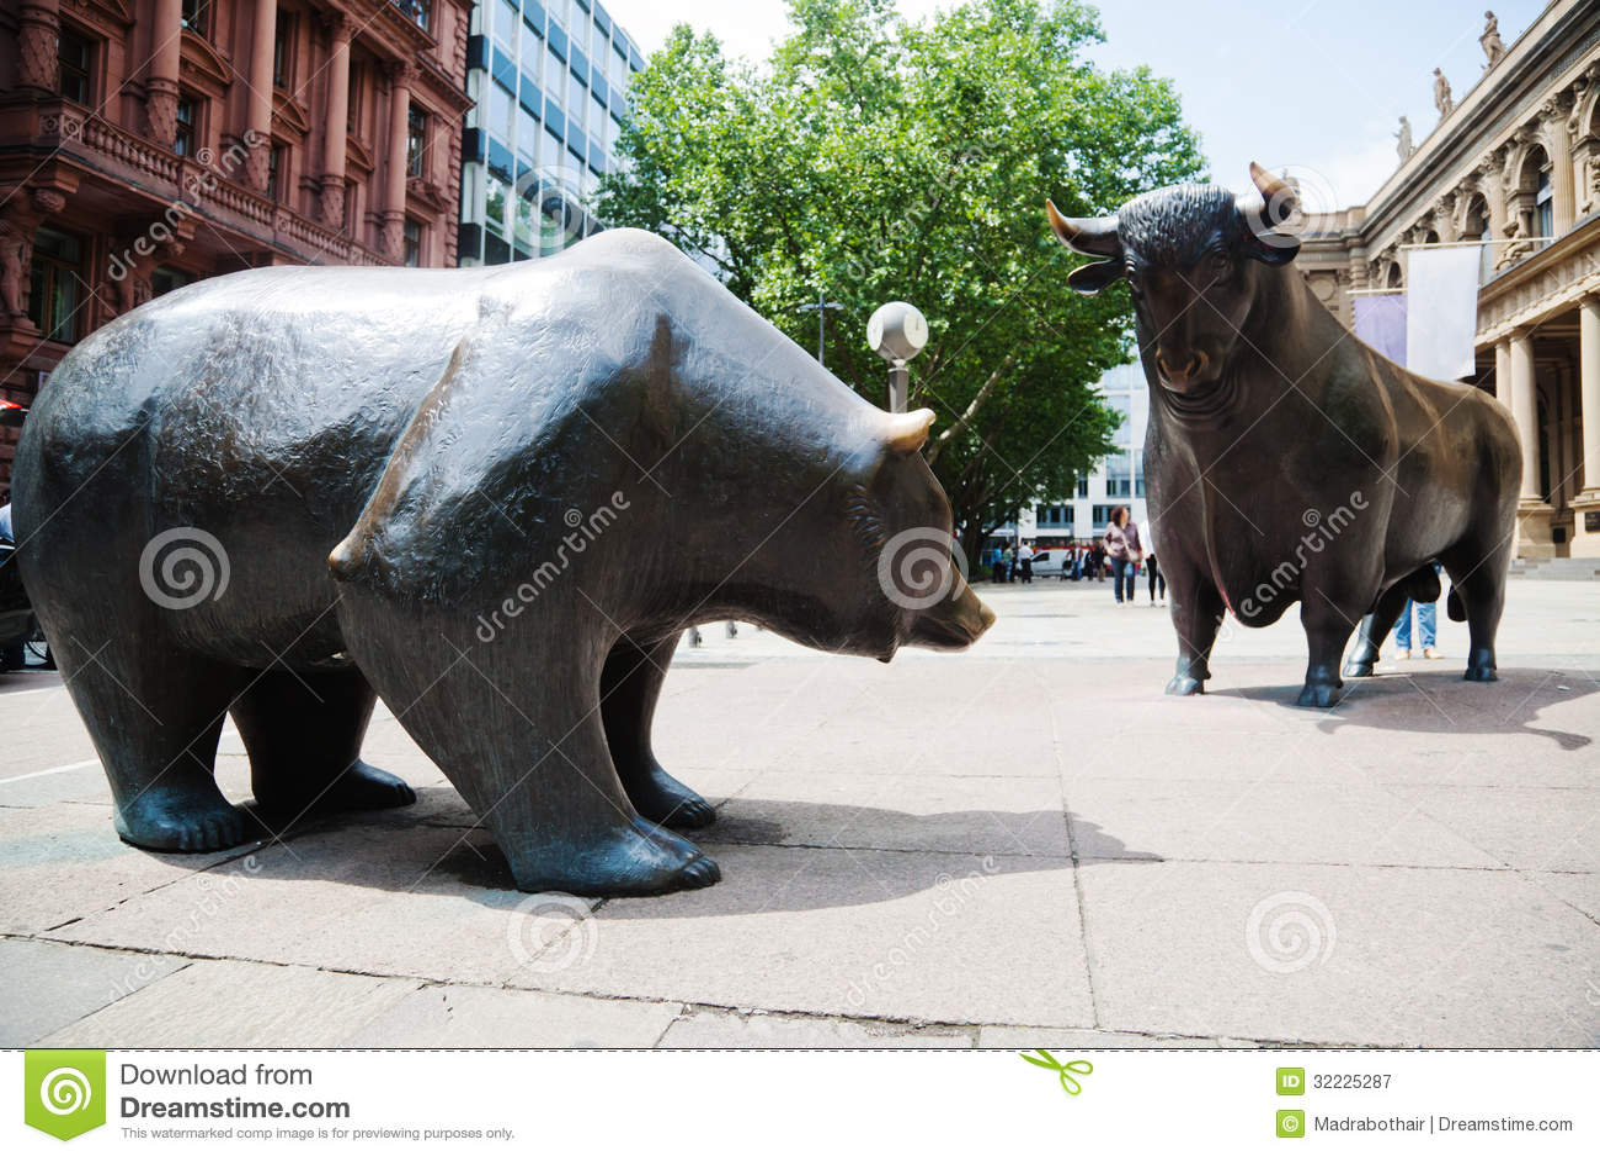 Bull And Bear Royalty Free Stock Photography Image 32225287